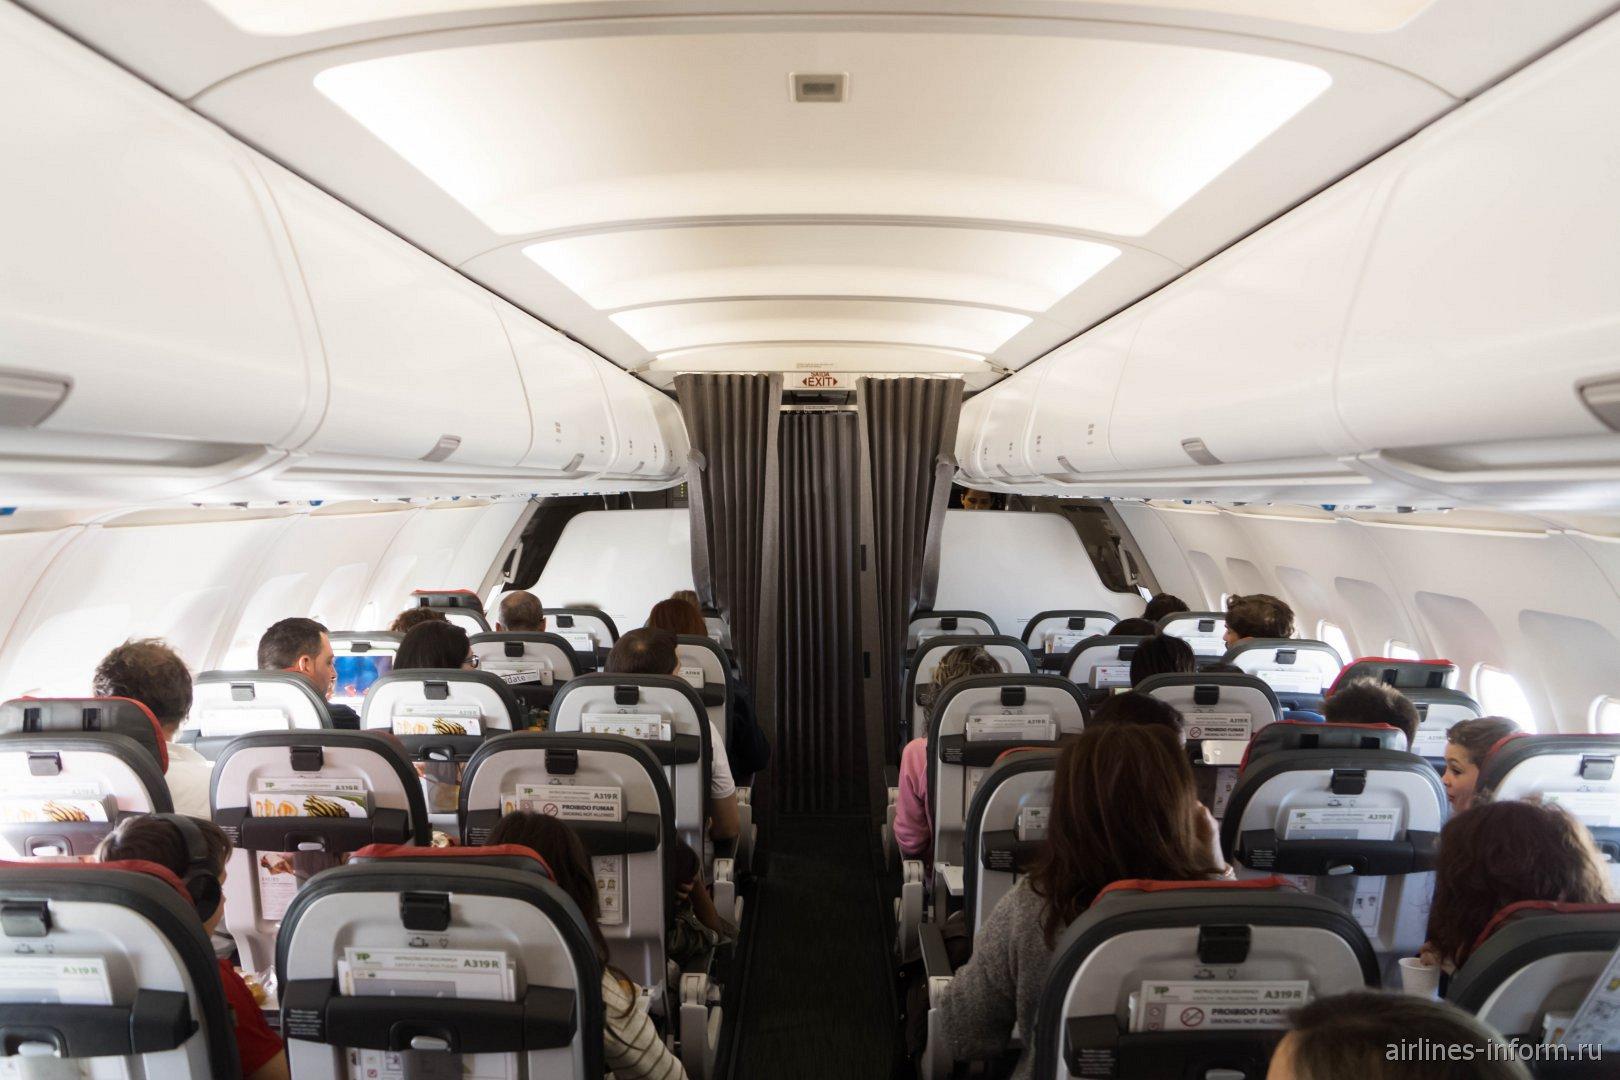 Пассажирский салон в самолете Airbus A319 авиакомпании TAP Portugal